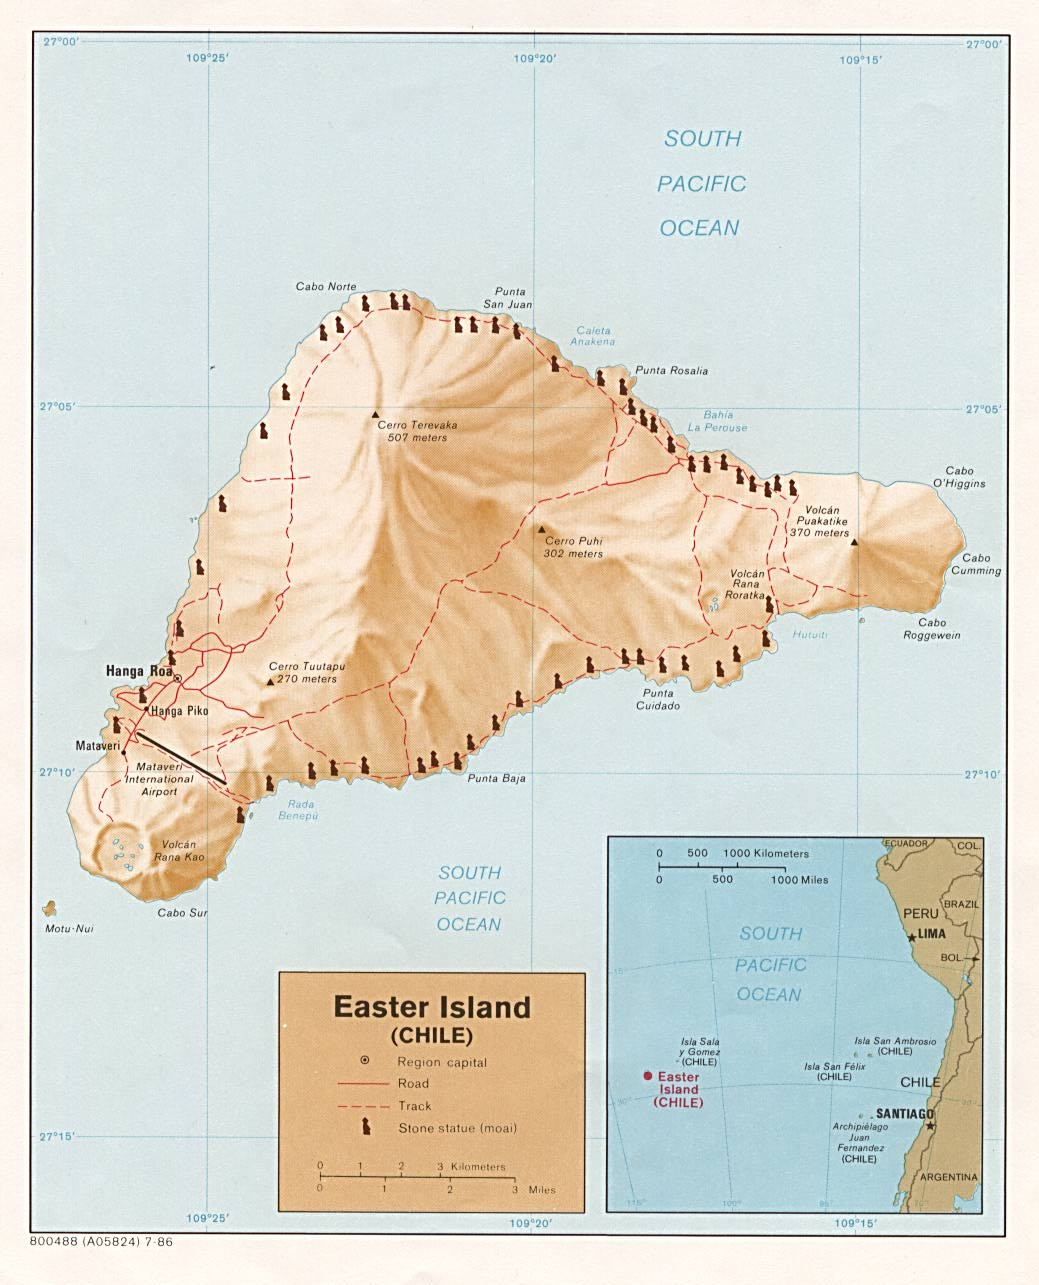 Mapa Relieve Sombreado de la Isla de Pascua